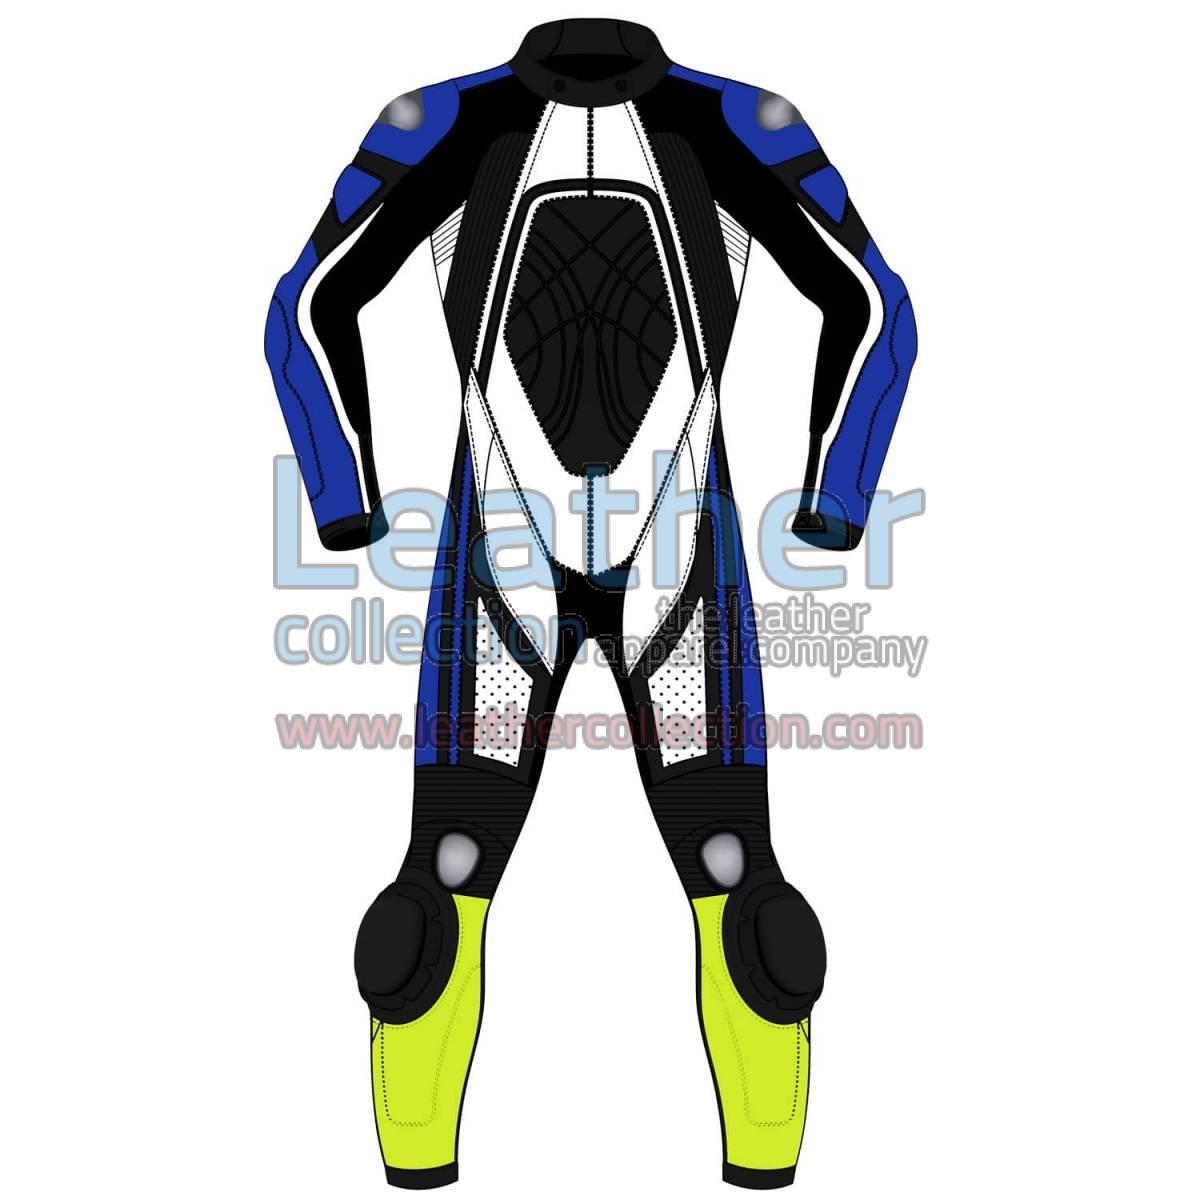 Quad Color One-Piece Motorbike Leather Suit For Men